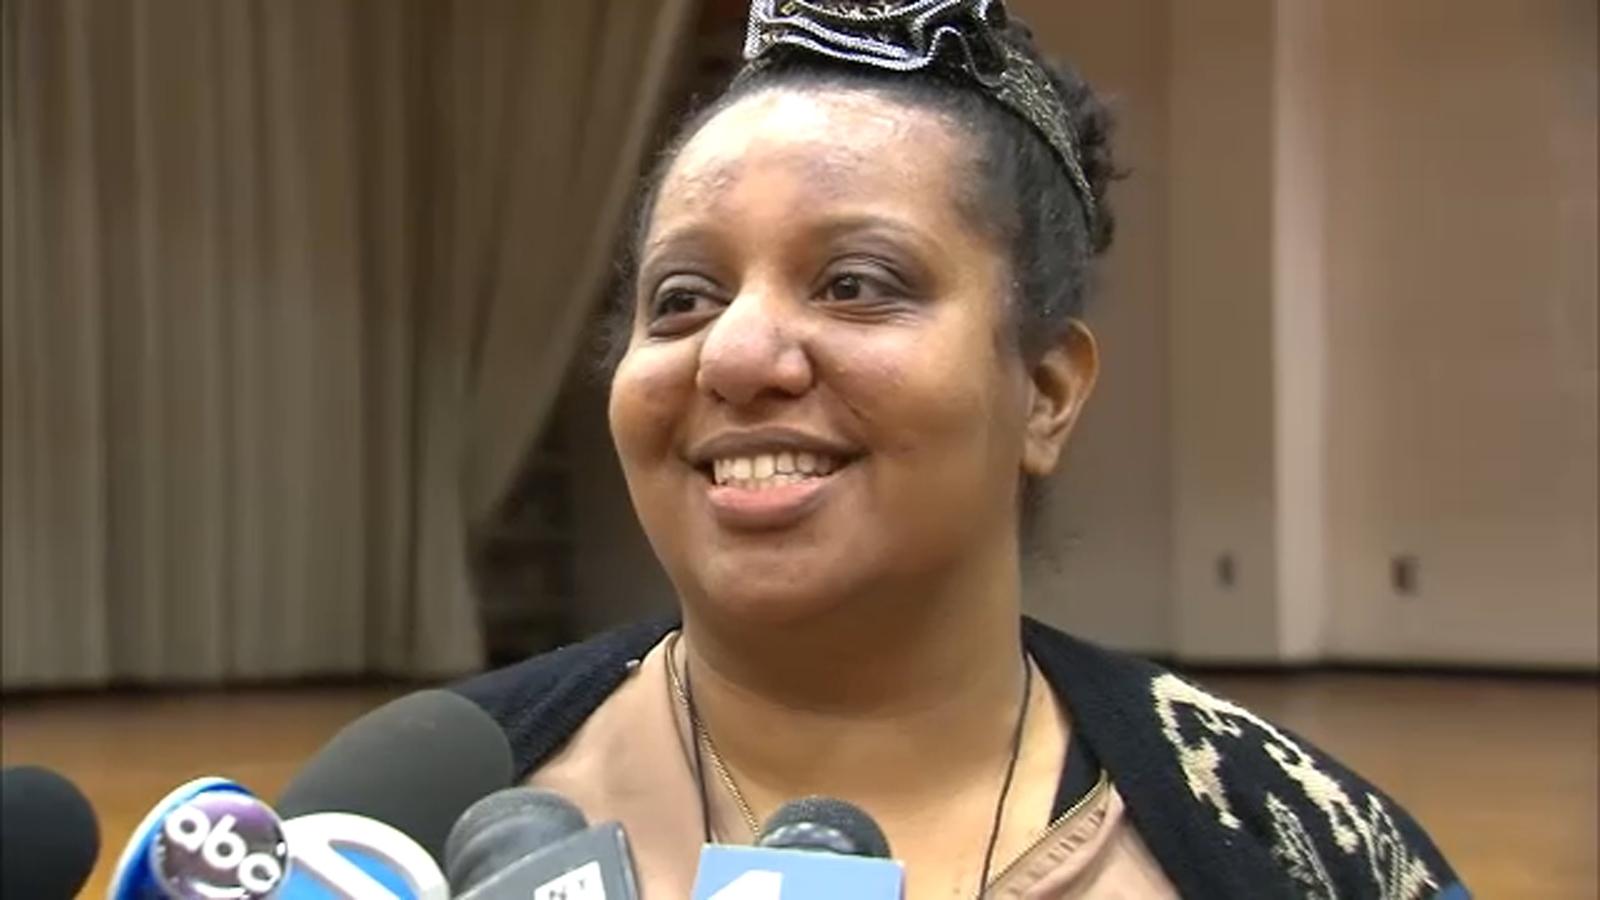 Brooklyn teacher wins Milken Educator Award, only winner in New York state